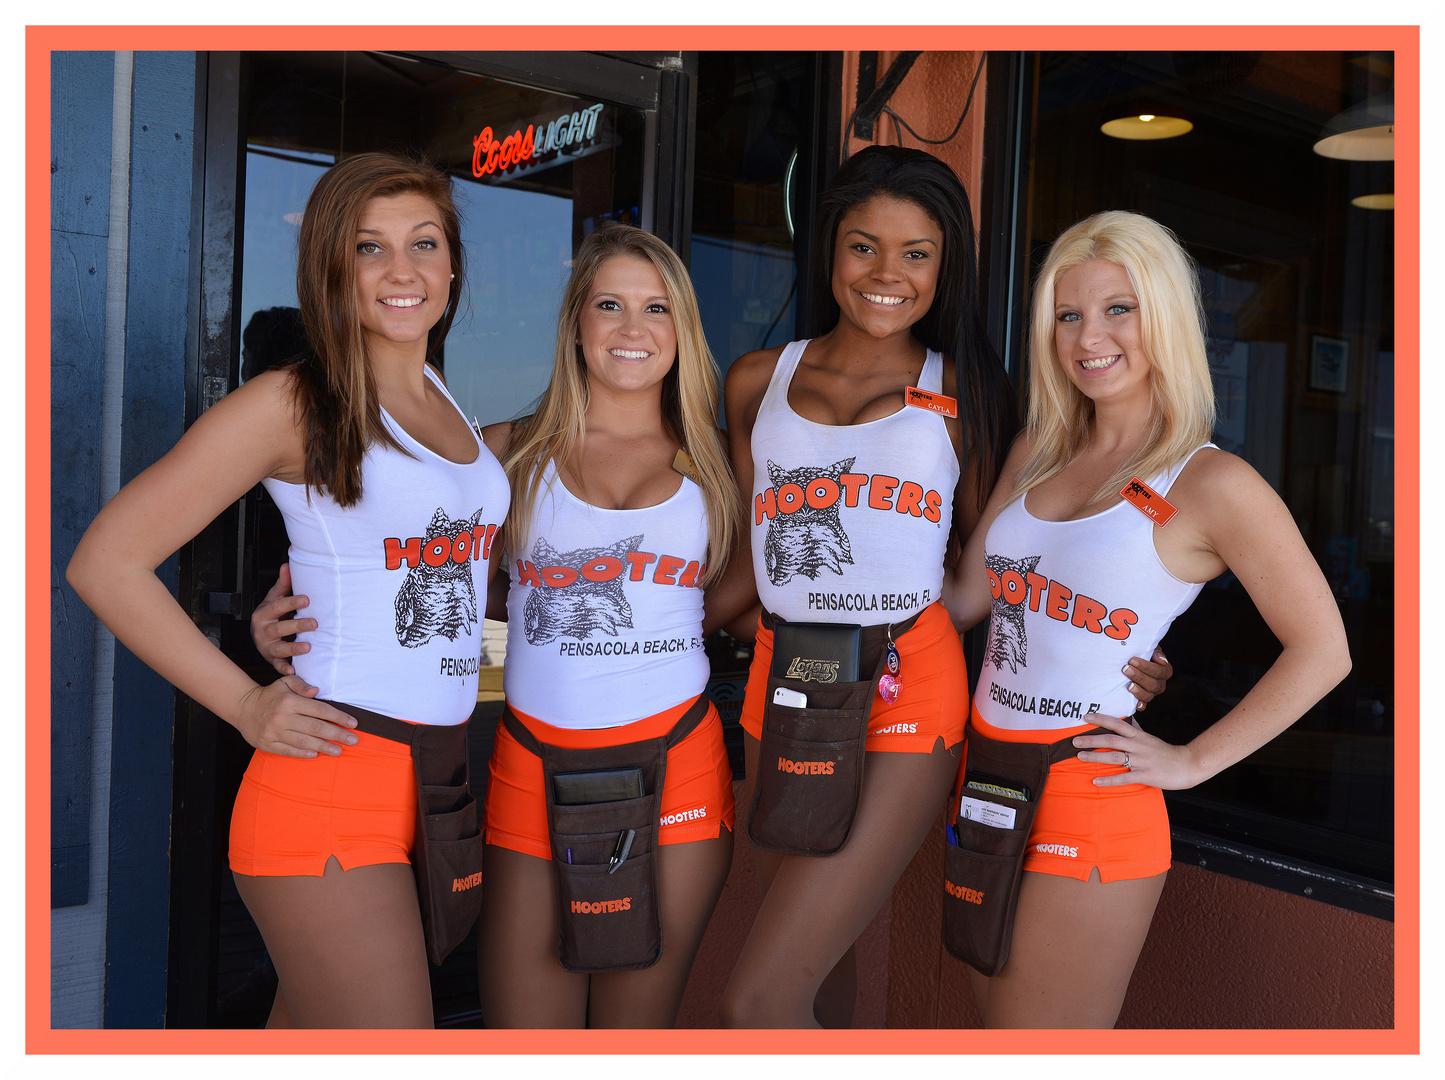 Hooters of Pensacola Beach, Florida